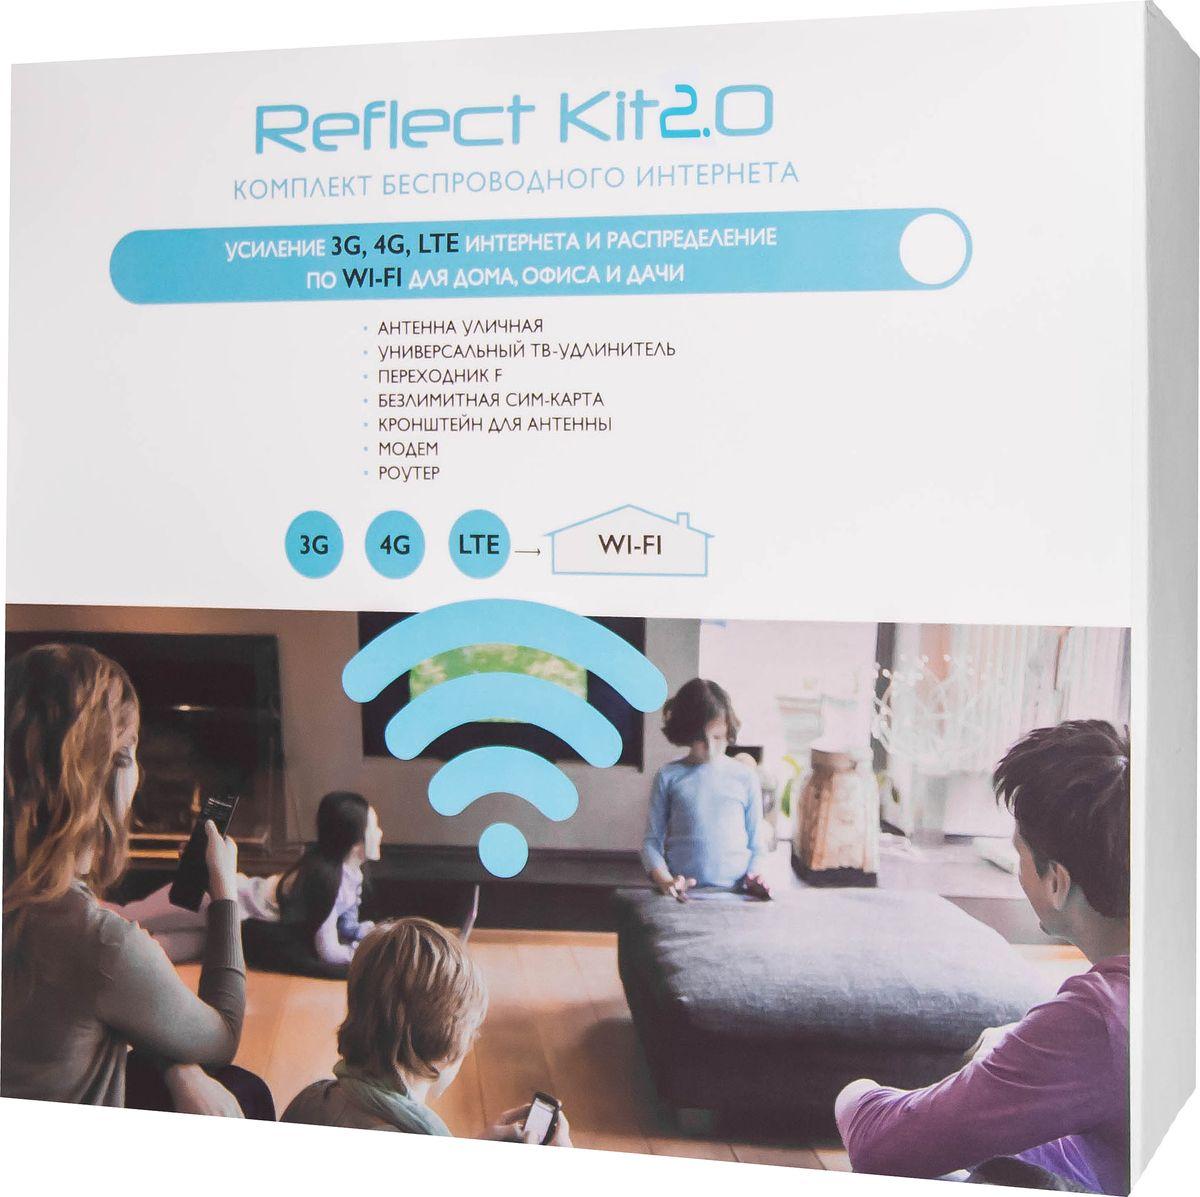 Reflect KIT 2.0, Black комплект беспроводного интернета 3G/4G/LTE